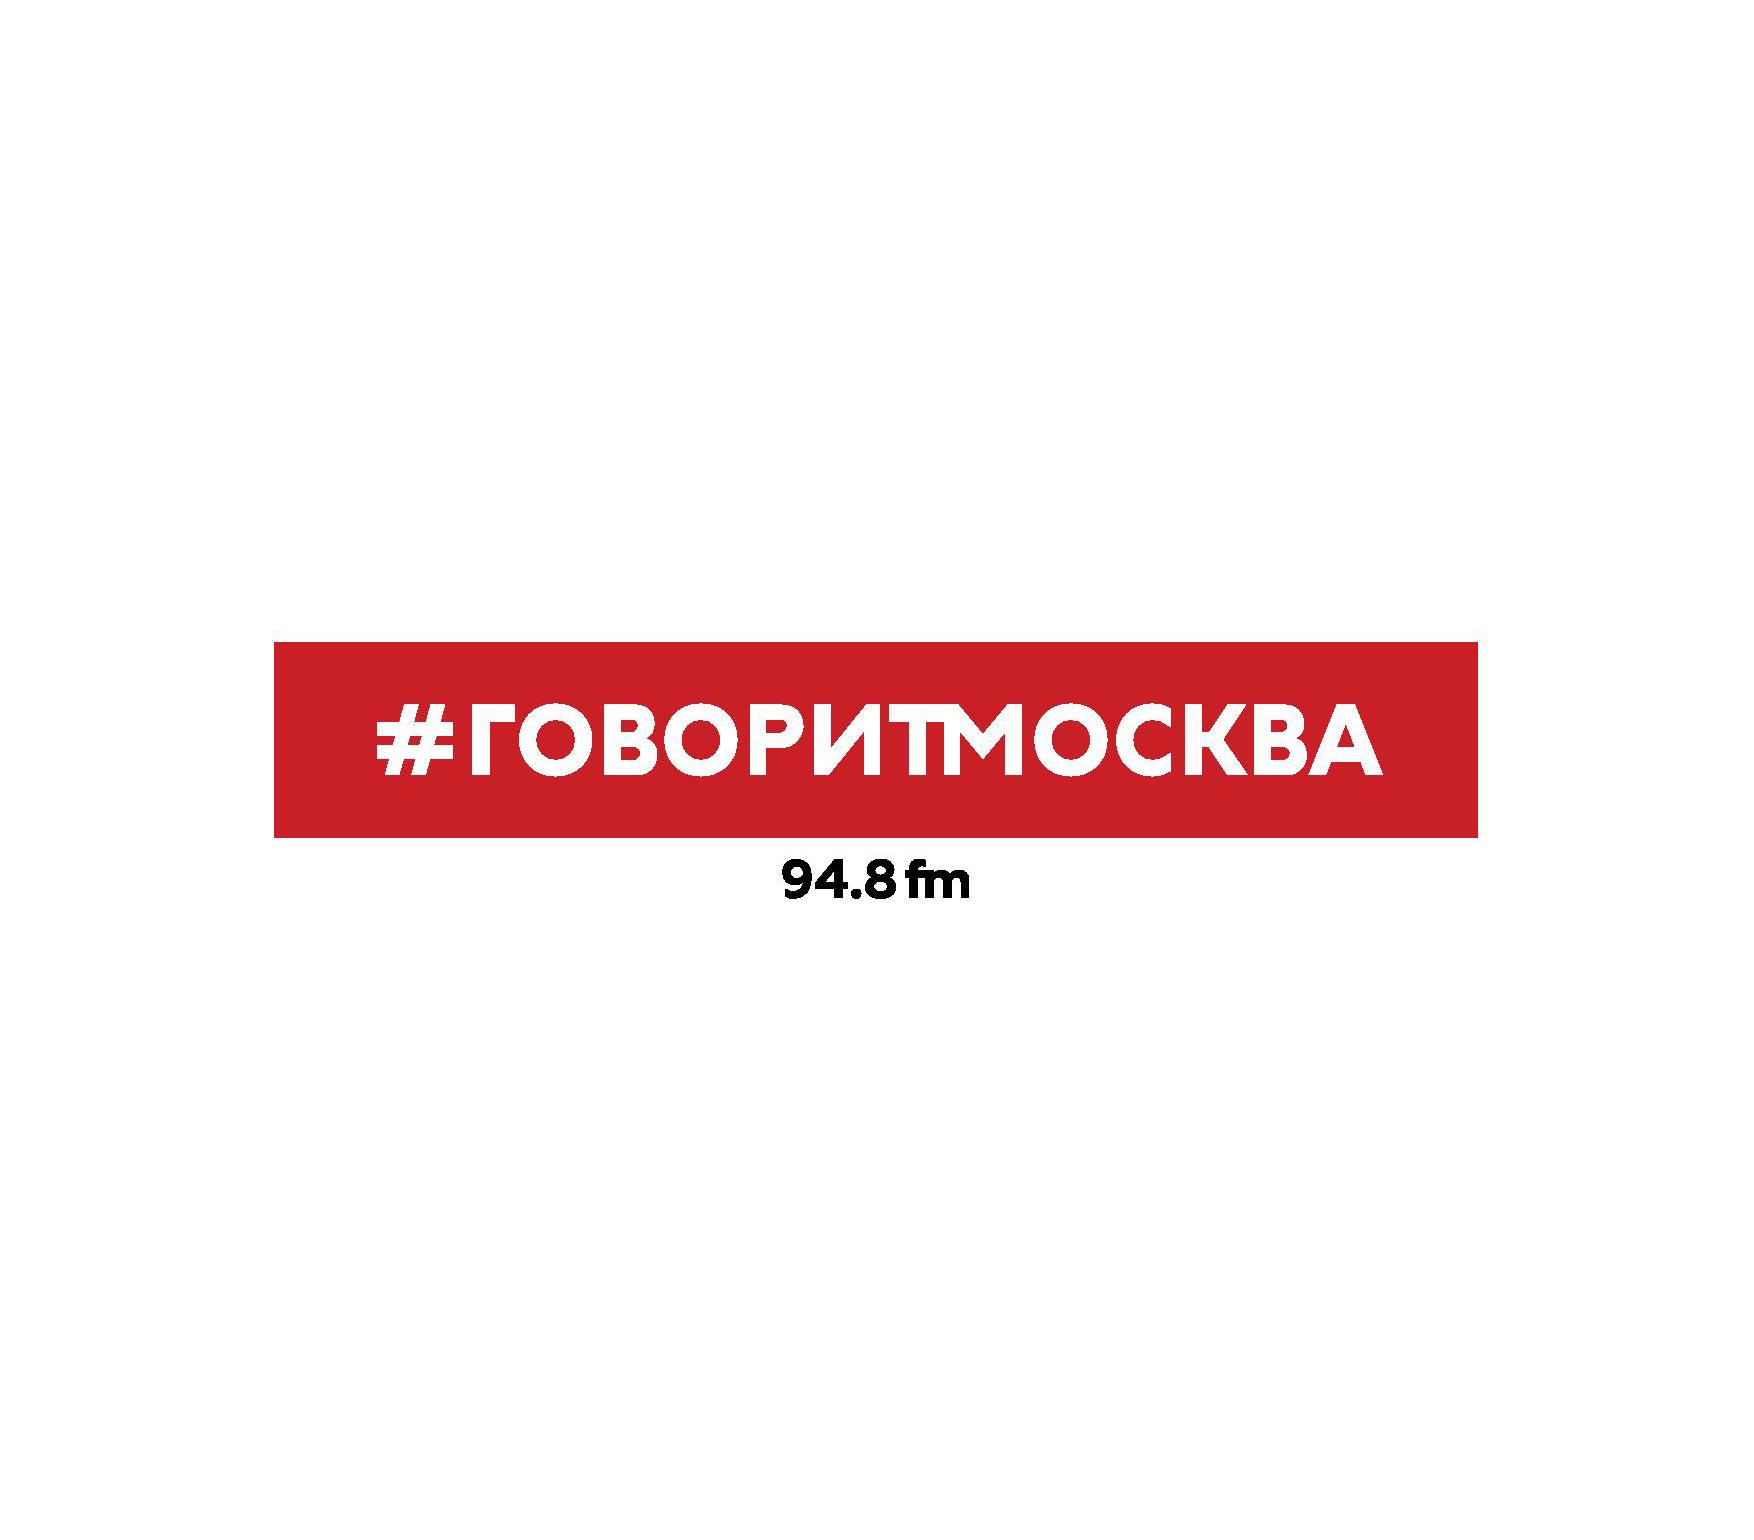 Станислав Симонов Посольства Москвы станислав симонов хитровка